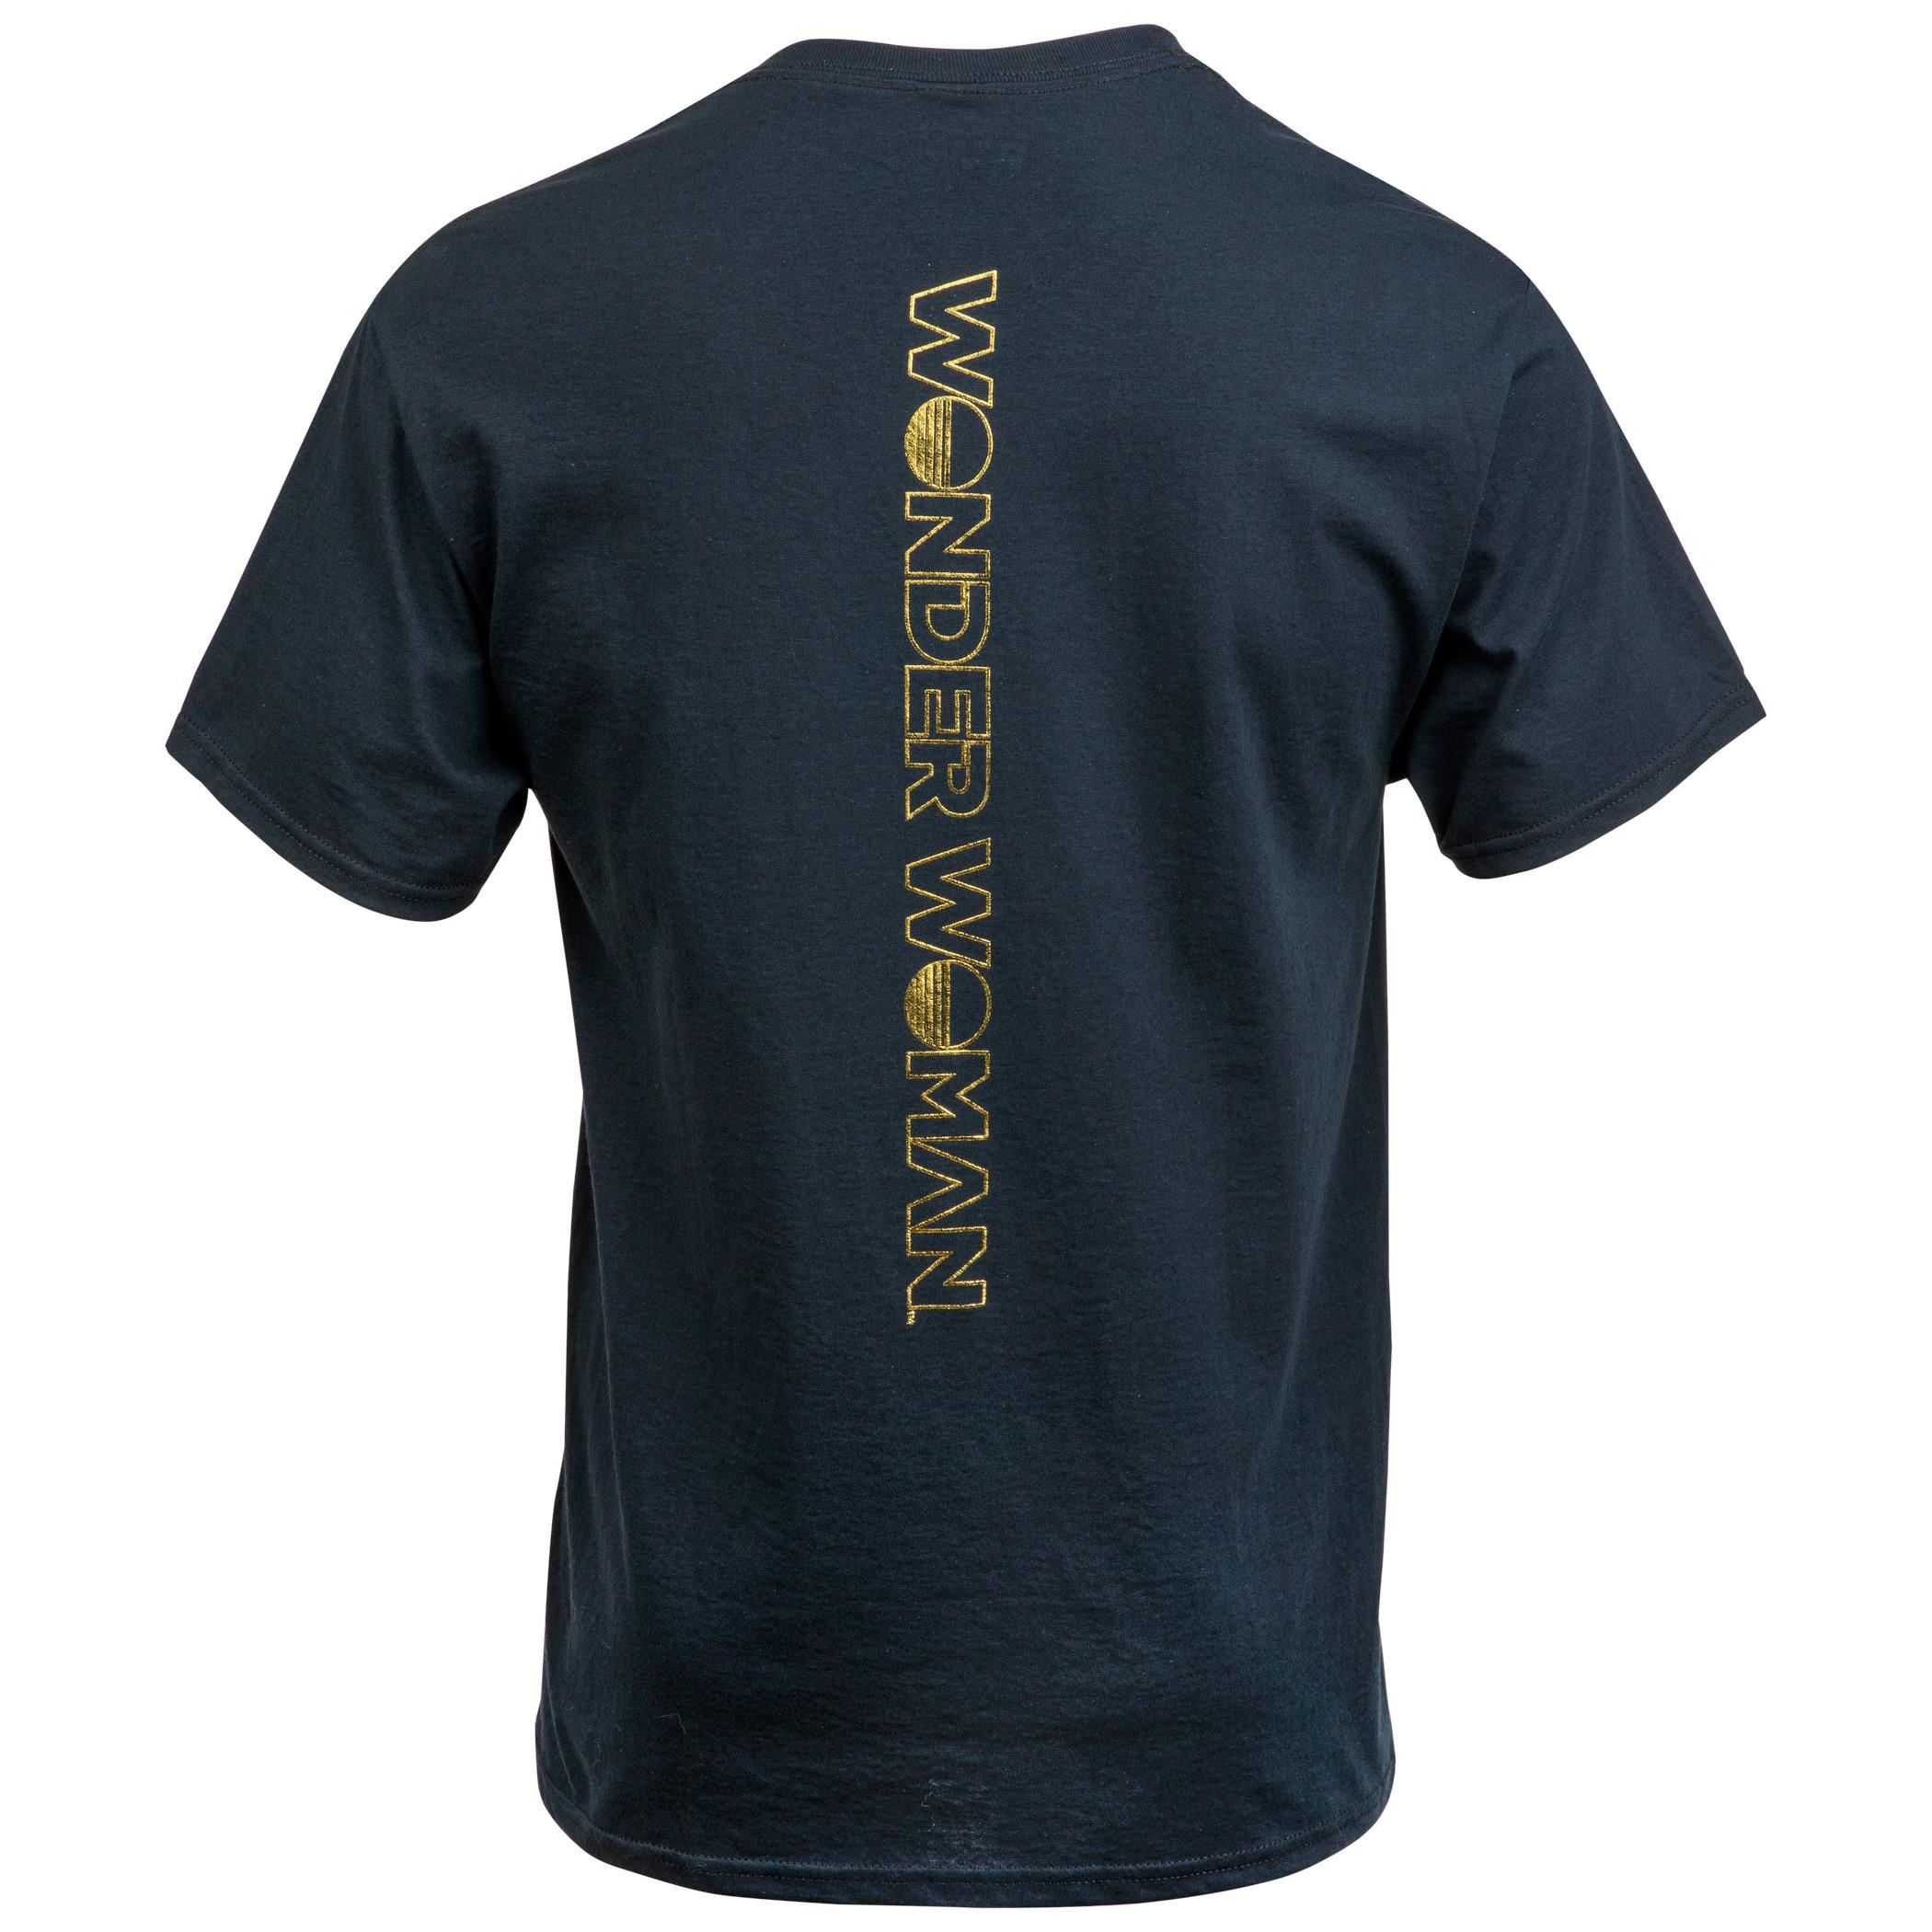 Wonder Woman 1984 Flight Scene with Back Print Women's T-Shirt